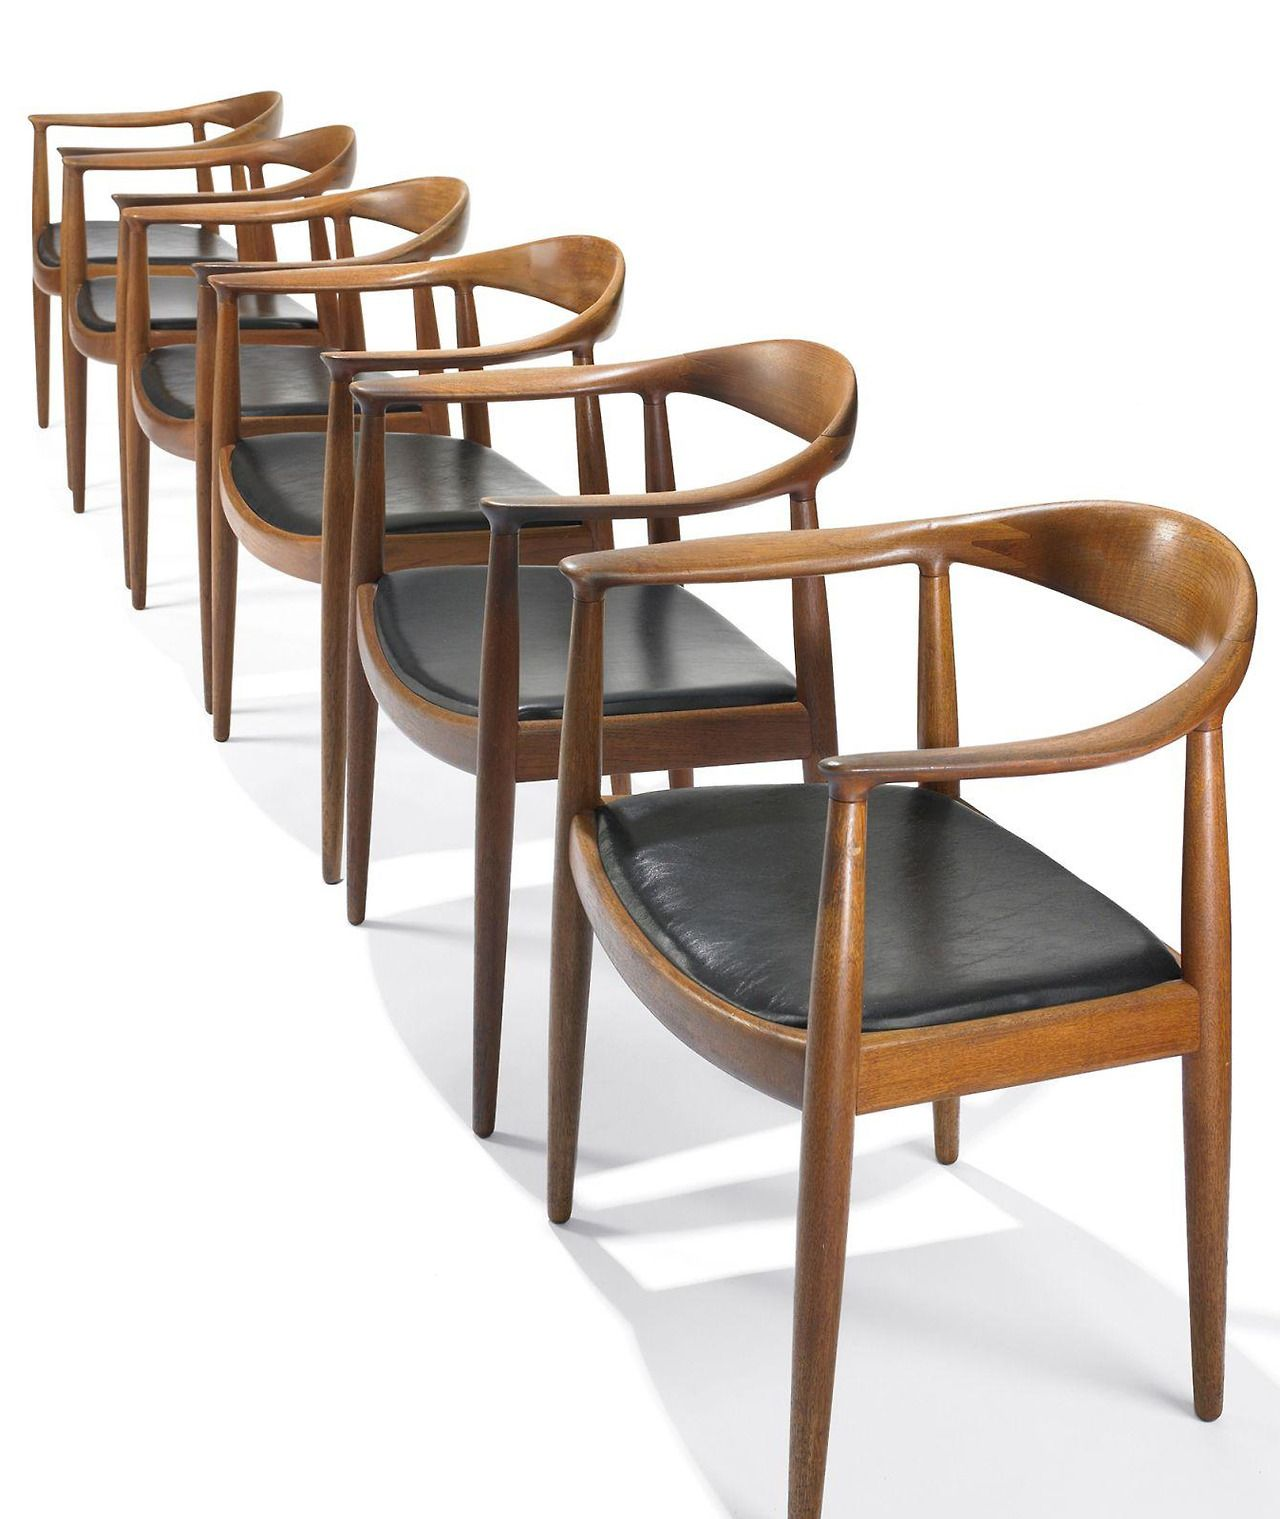 The Chair Model Pp503 By Hans J Wegner 1949 Originally